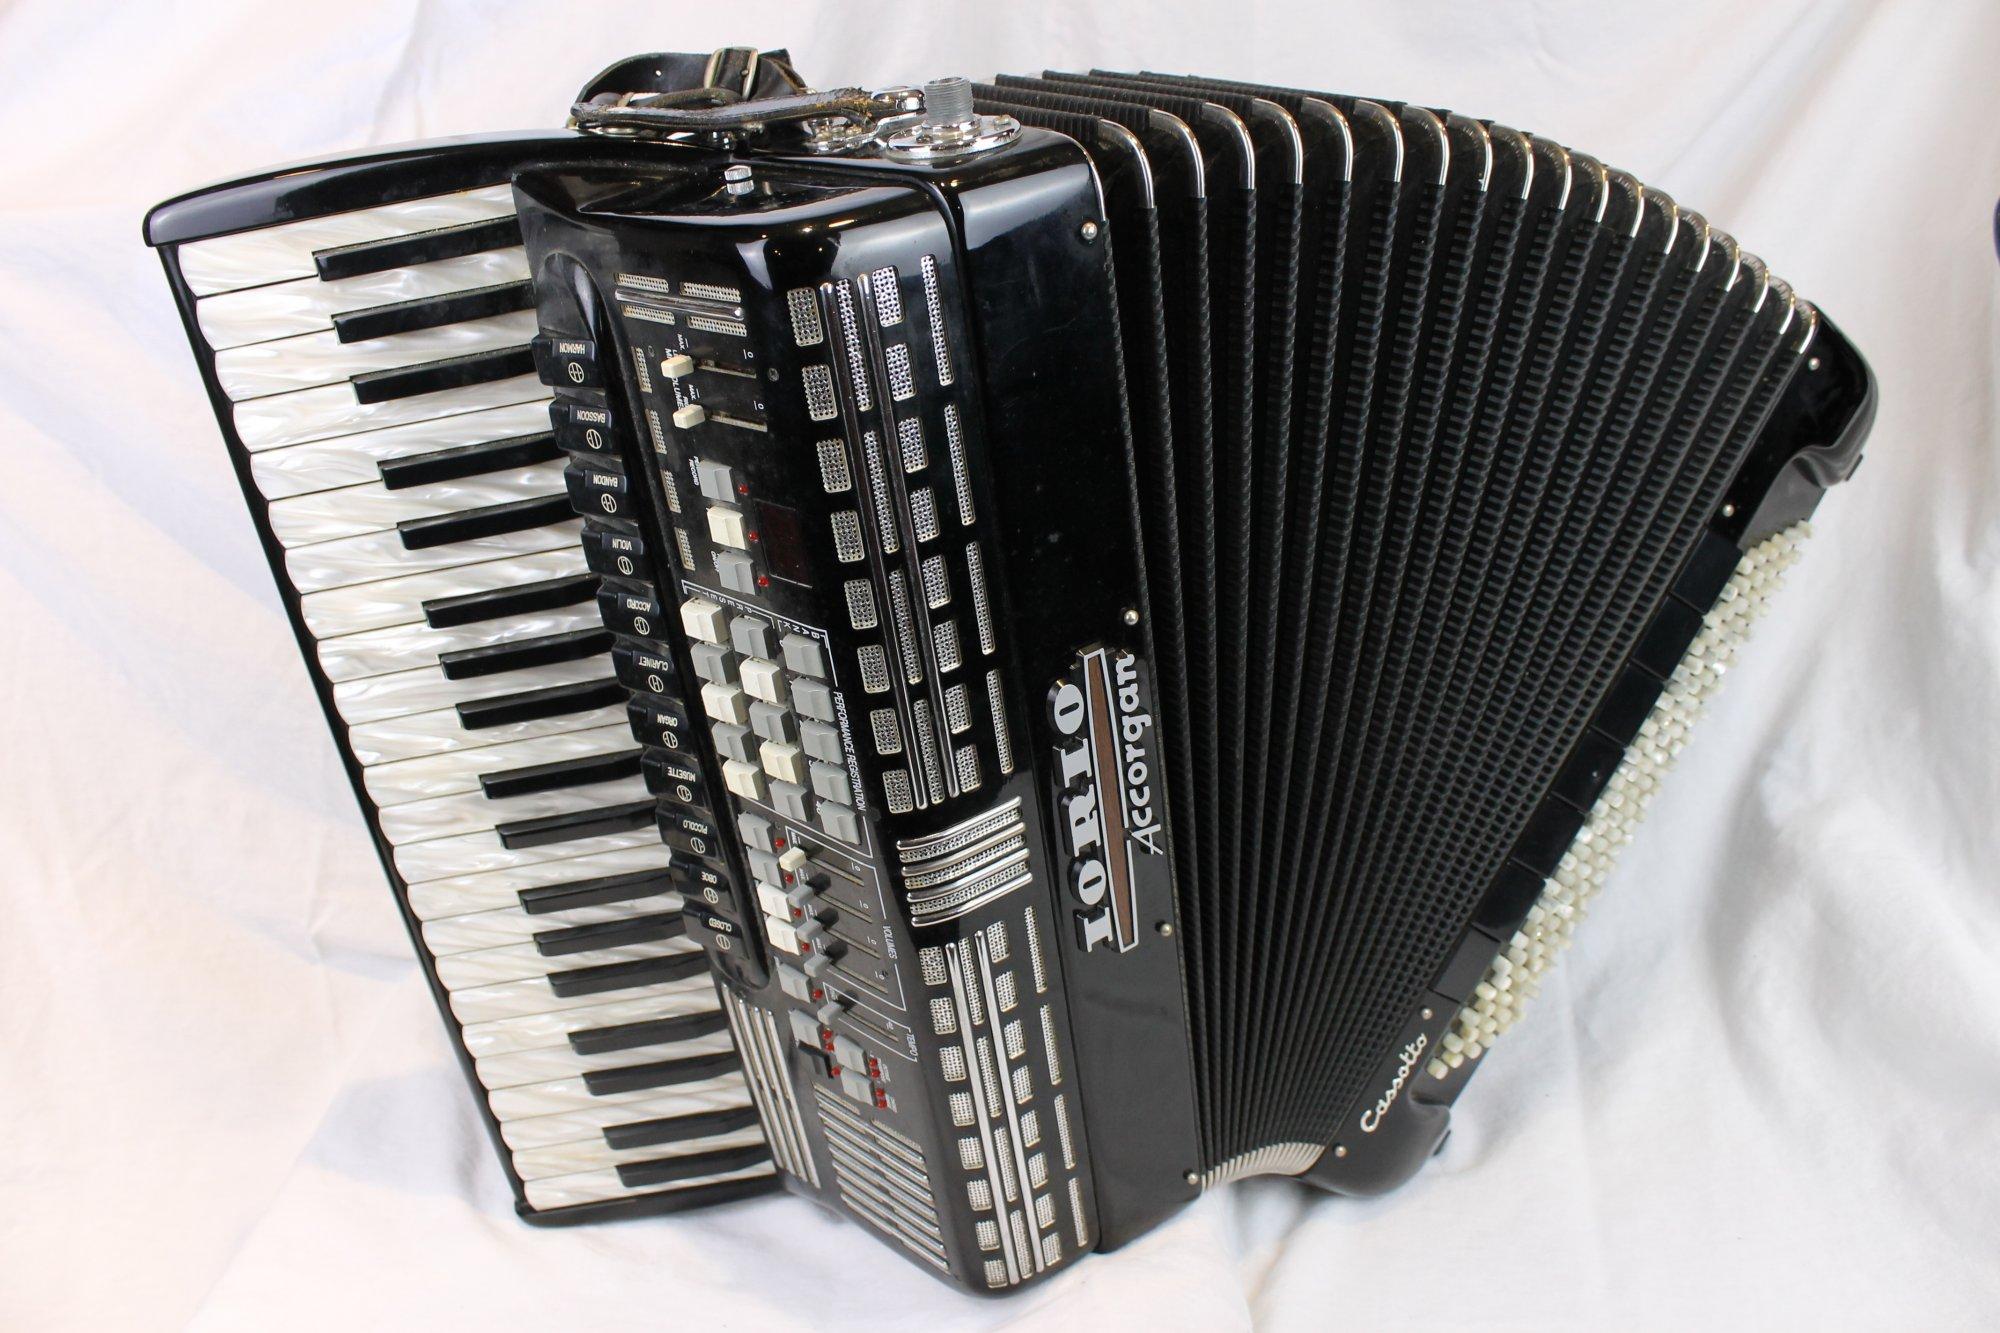 3816 - Black Iorio Accorgan H-Series Cassotto Piano Accordion LMMH 41 120